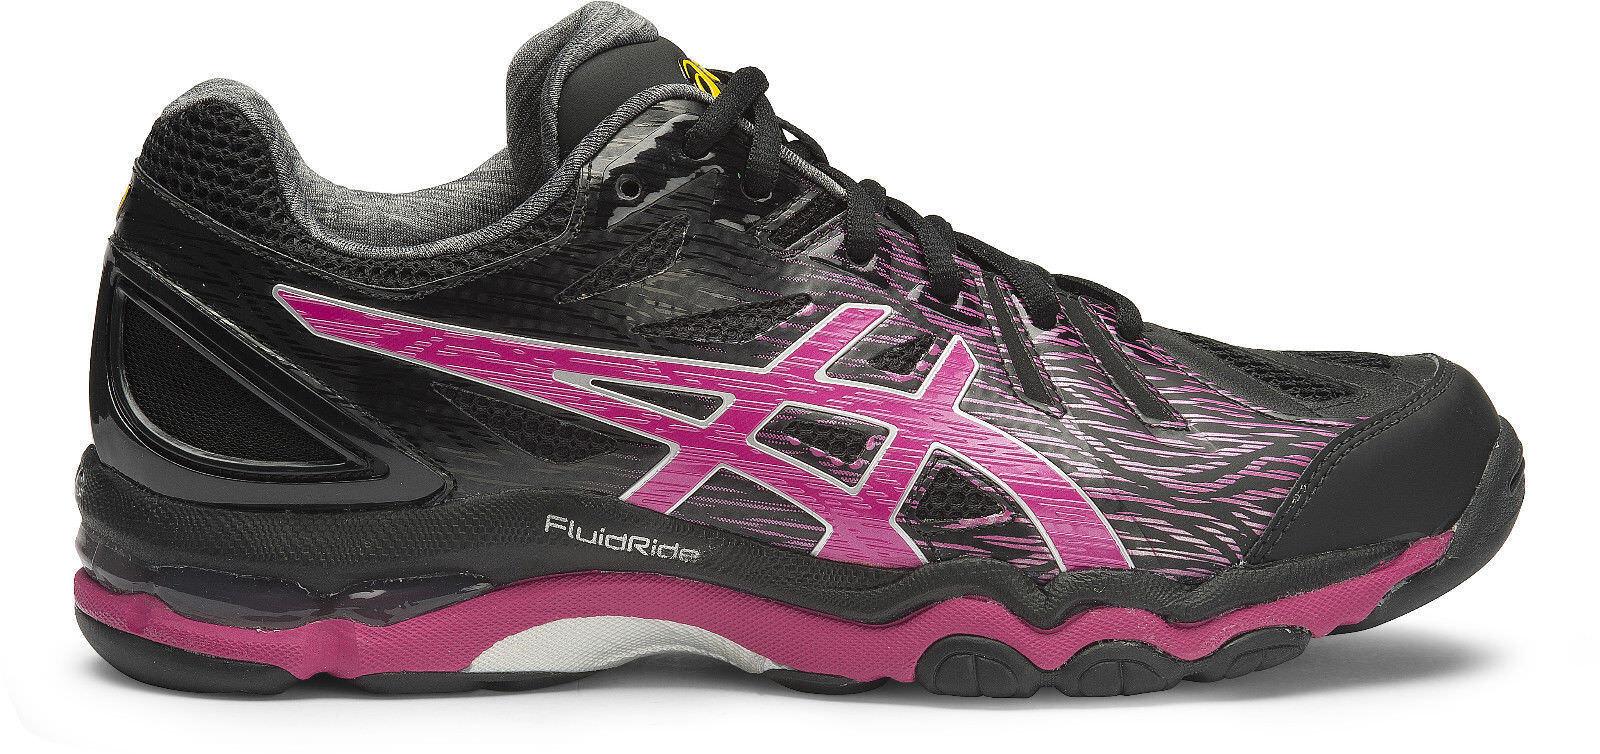 SUPER SPECIAL    Asics Gel Netburner Super 6 femmes Netball chaussures (B) (9021)